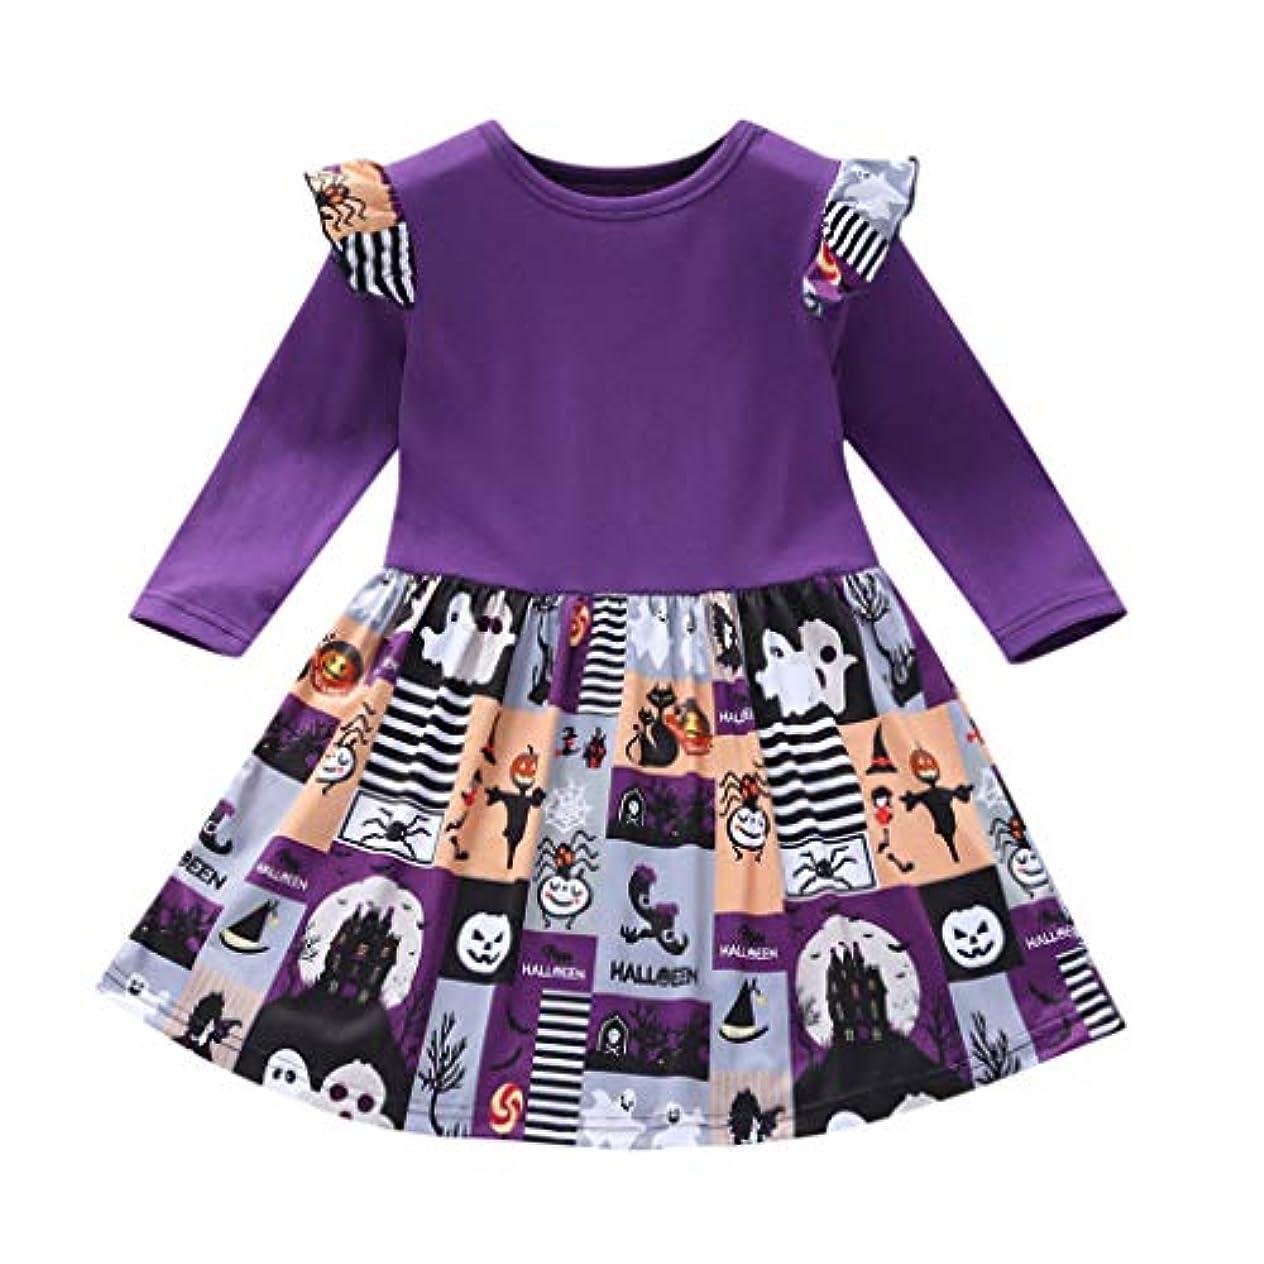 MISFIY 新生児 ベビー服 ガールズ 女の子 子供 ドレス プリンセススカート 綿 肌着 ハロウィン Halloween パープル かわいい 柔らかい 誕生記念 出産祝い